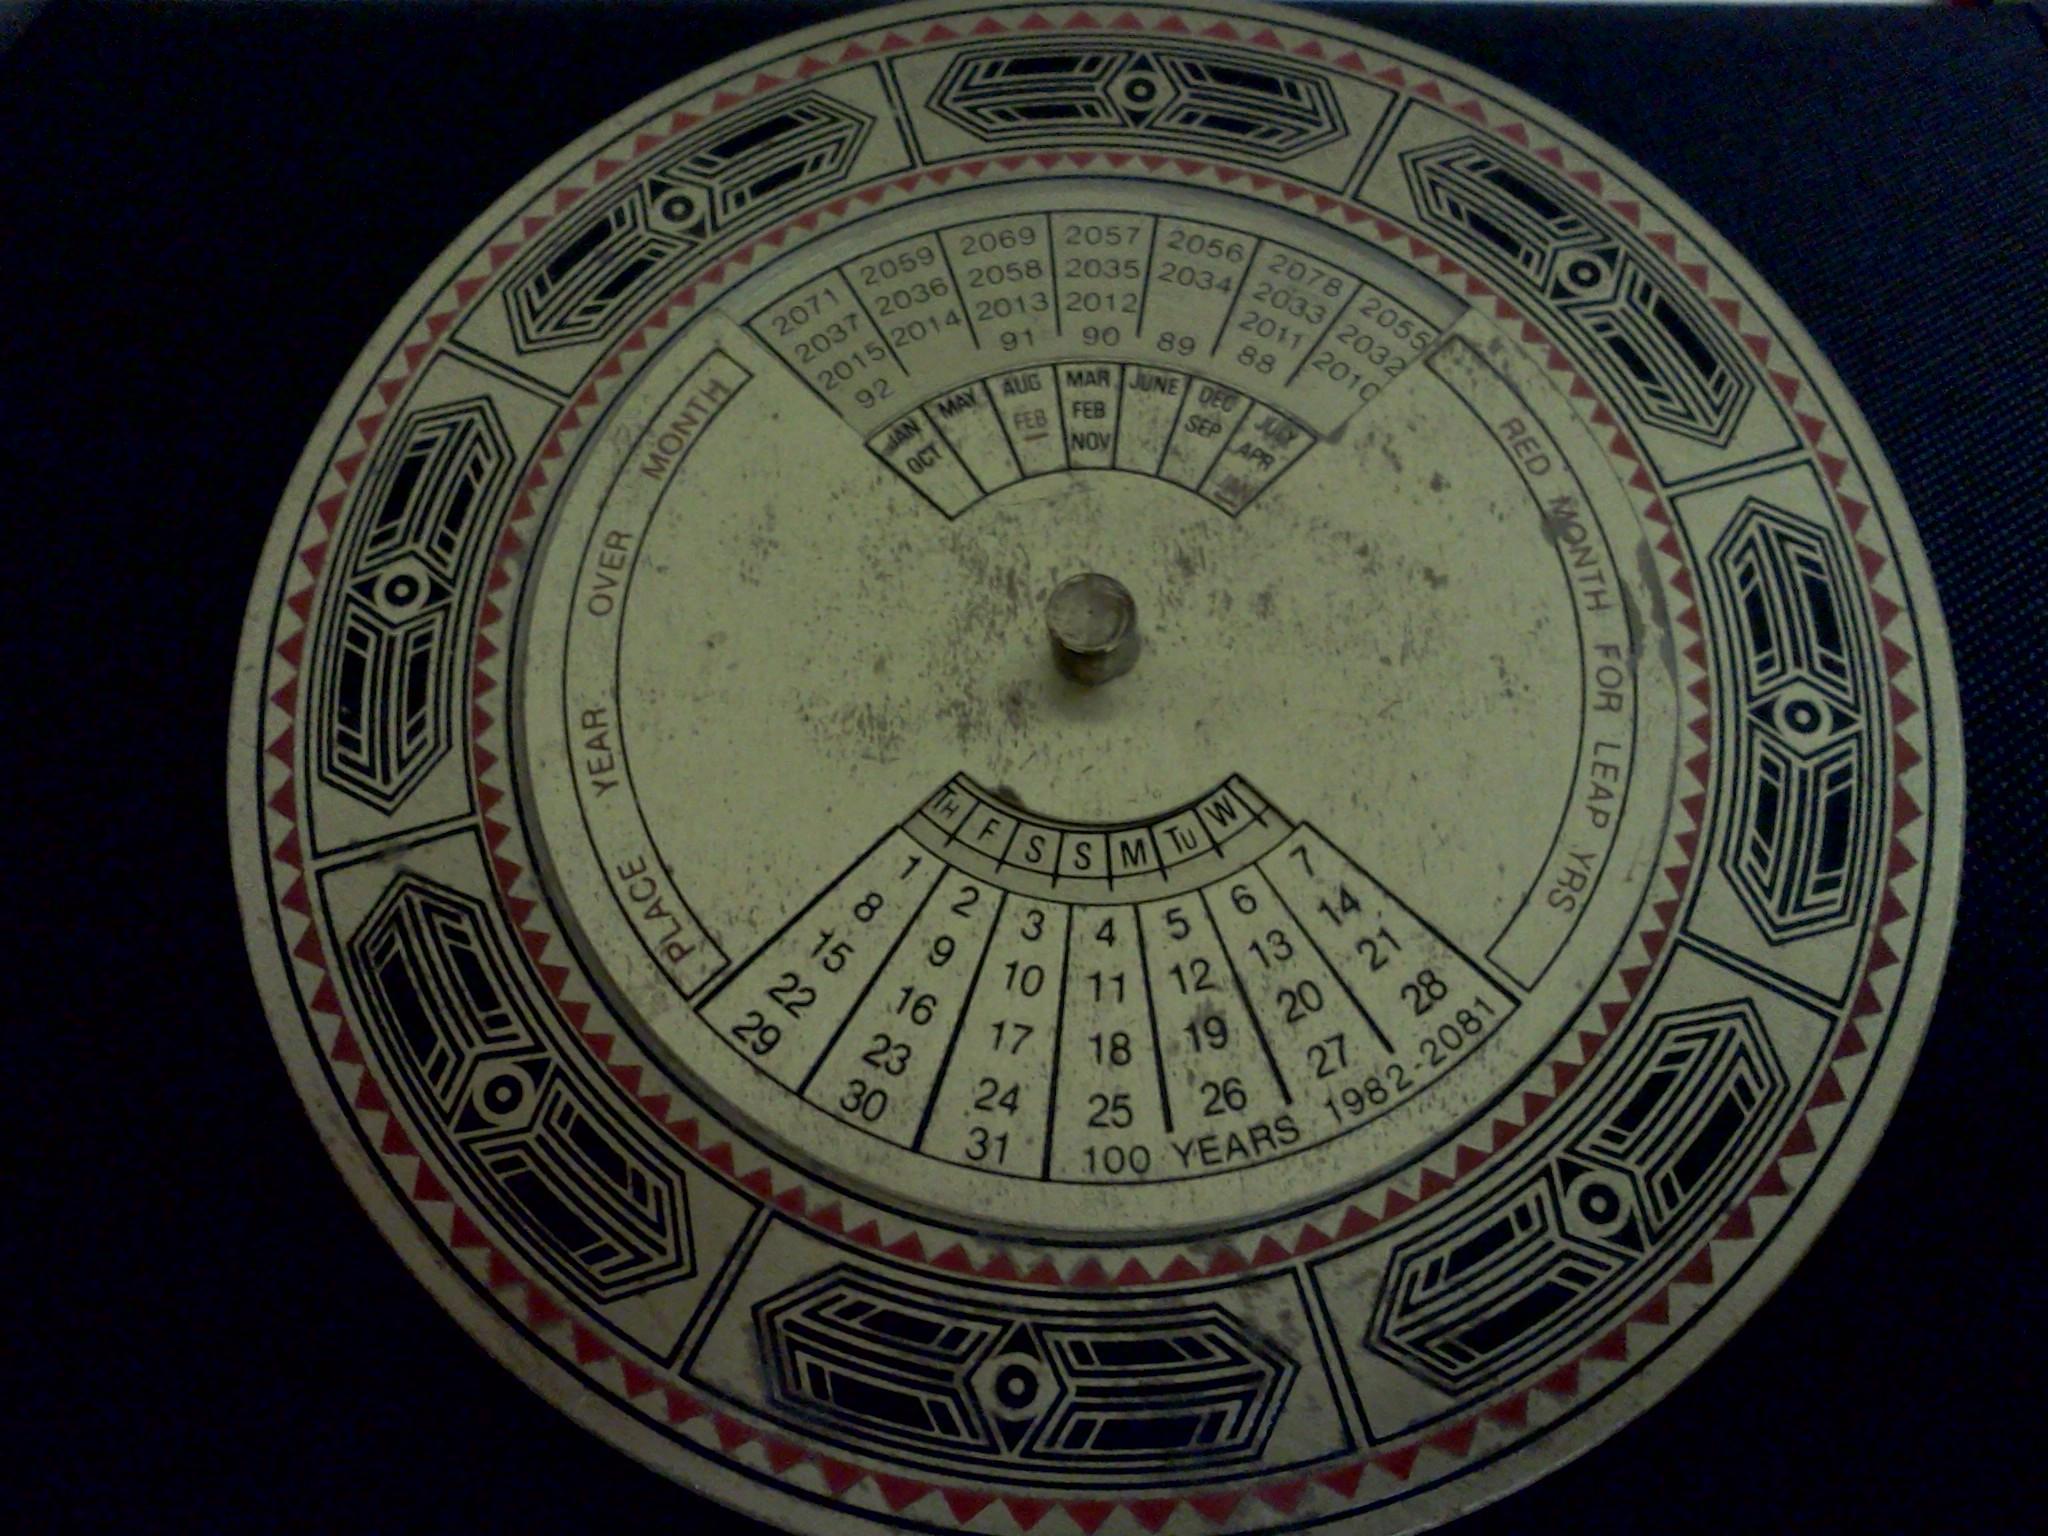 Perpetual Calendar 1800 To 2050 : Servois perpetual calendar with an english translation